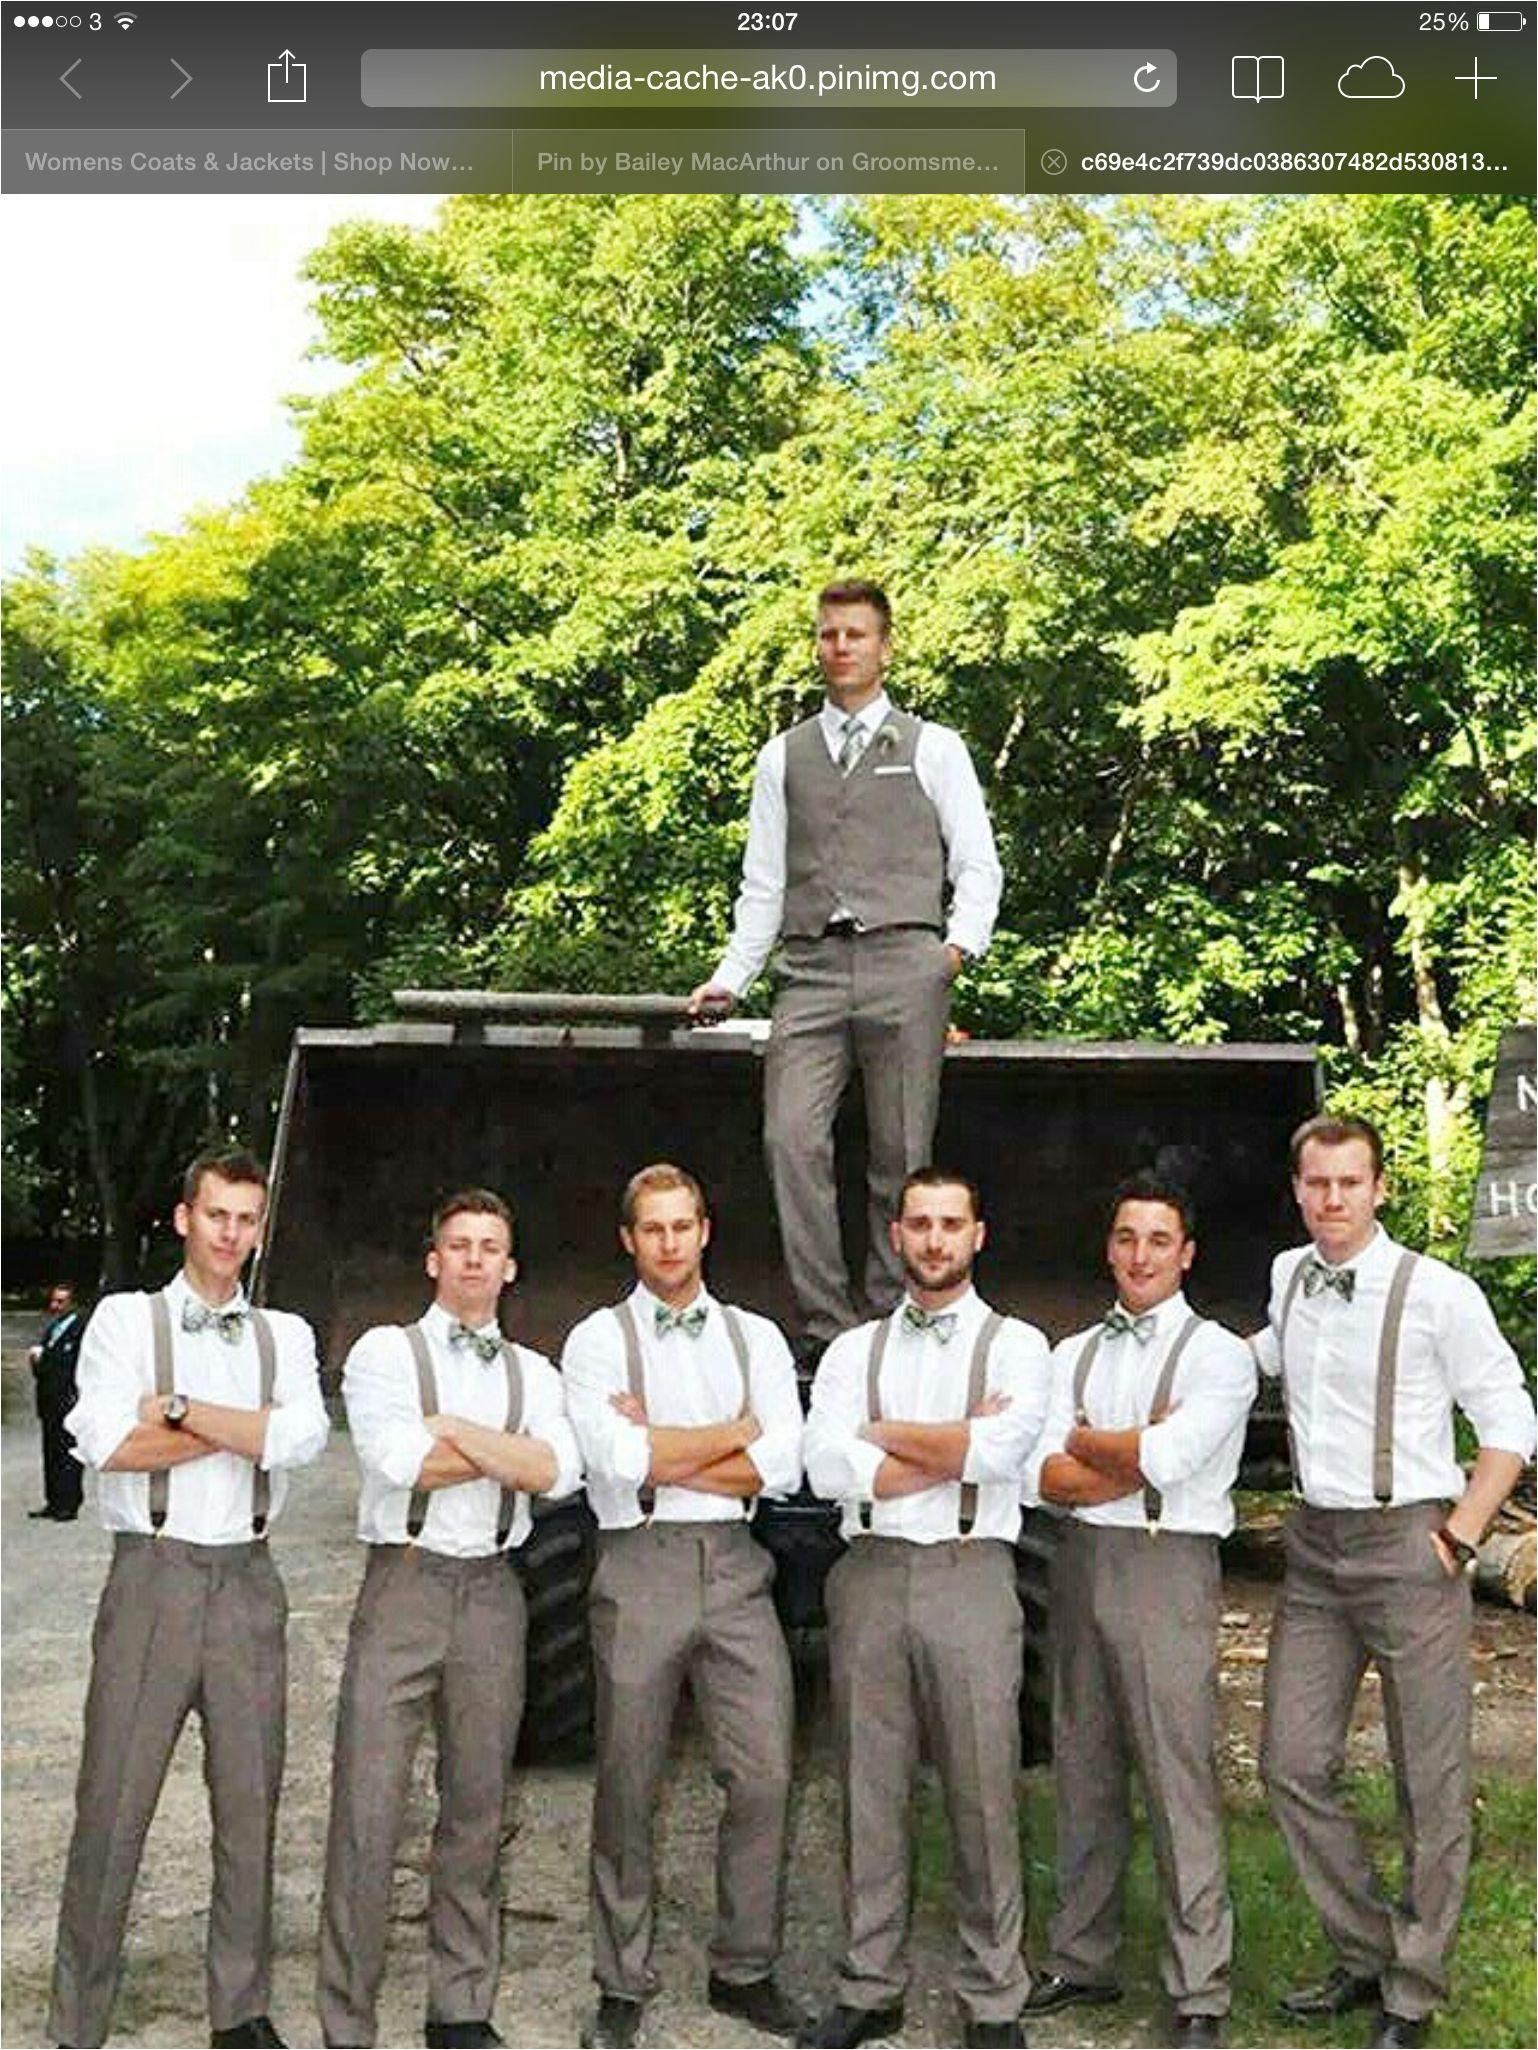 Fabulous Vintage Groomsmen Attire Ideas Https Bridalore 2017 10 Country Wedding